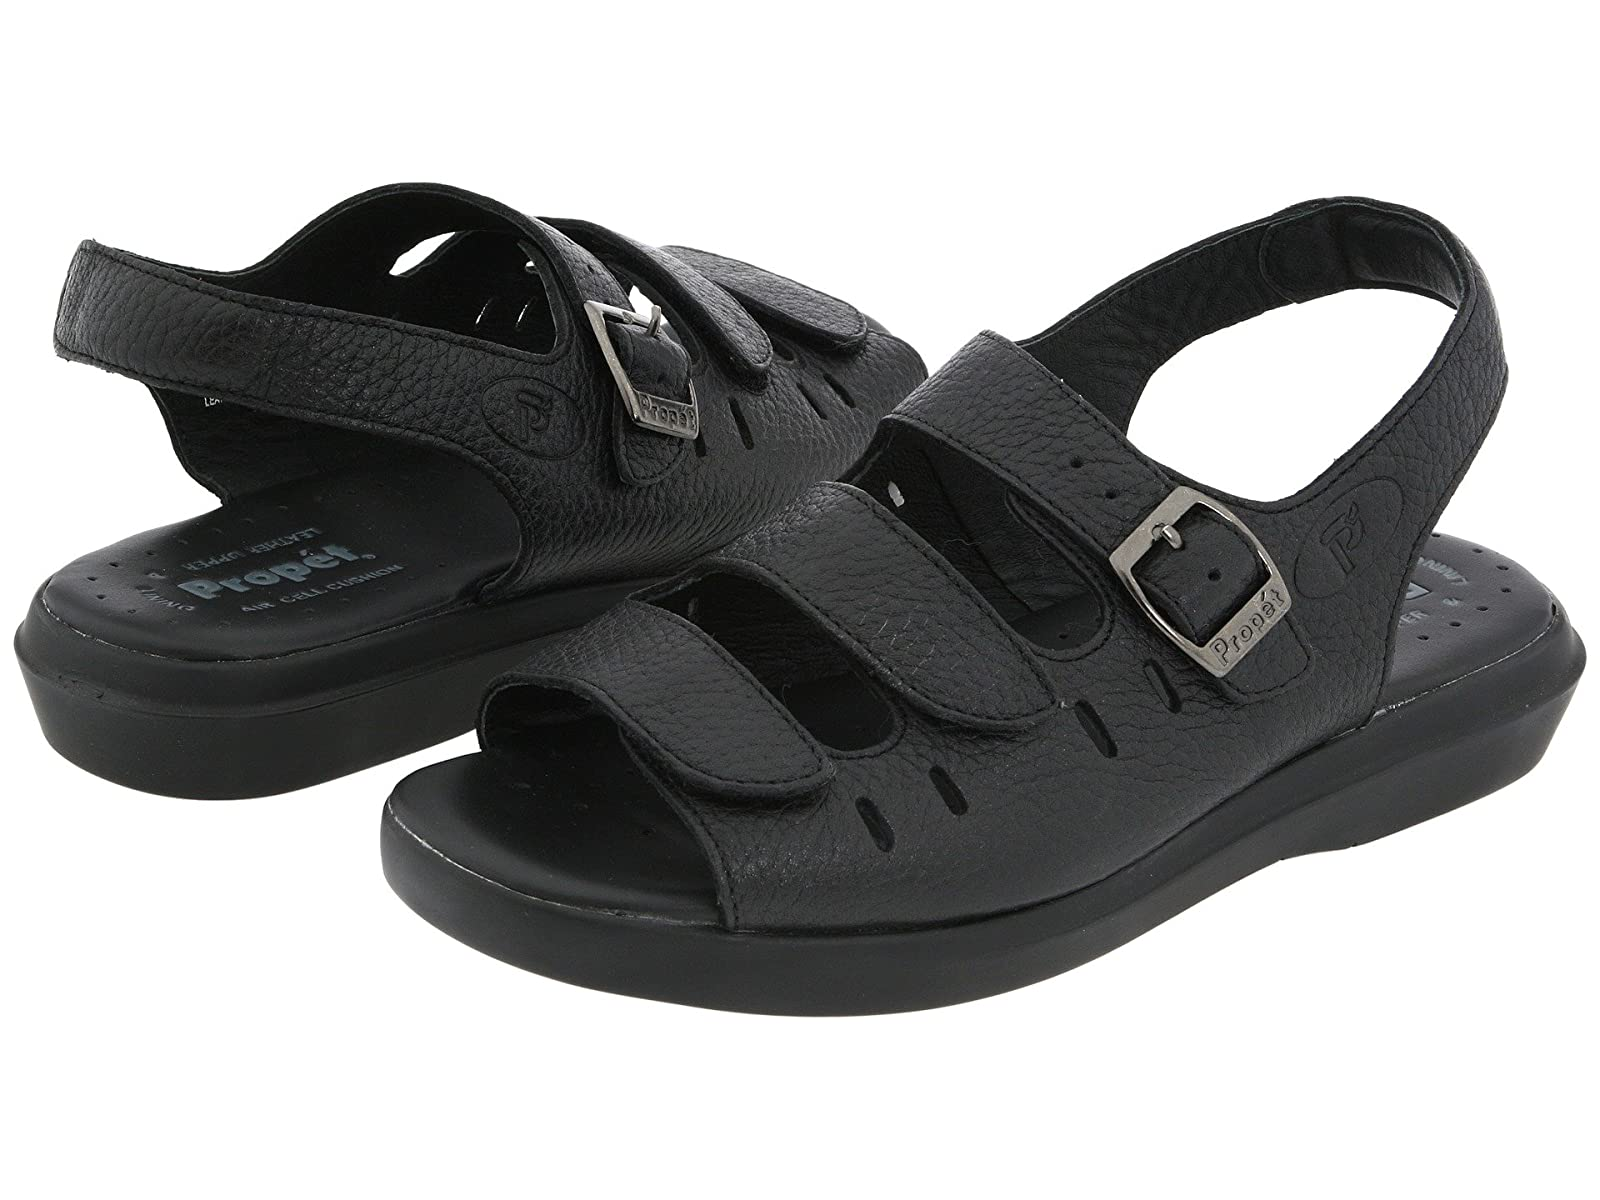 Propet Breeze WalkerAtmospheric grades have affordable shoes